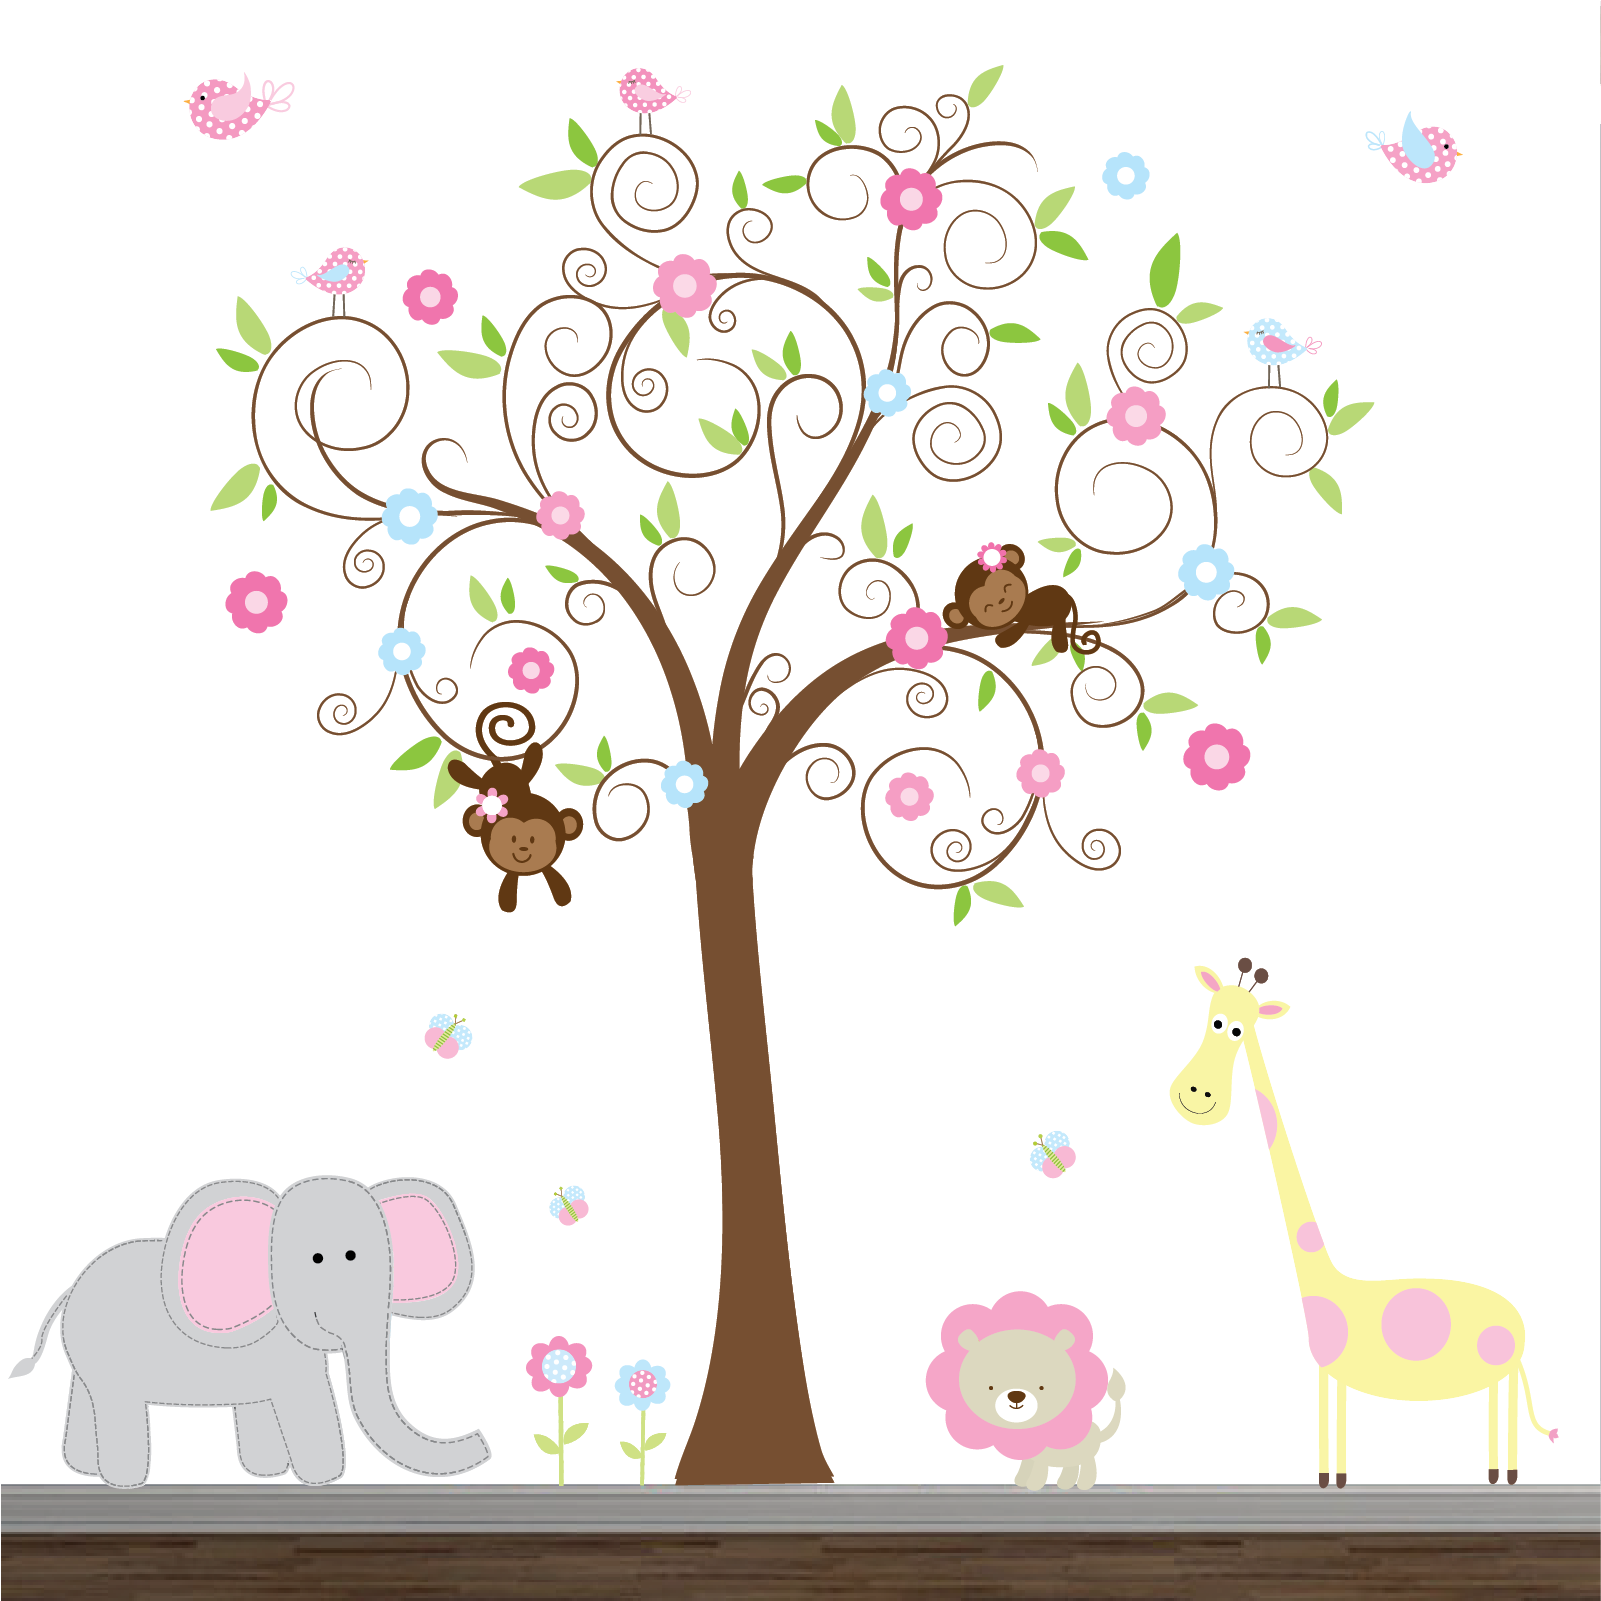 Jungle Vinyl Decals Nursery Wall Decal with Elephant Lion  sc 1 st  Pinterest & Girls Jungle Decal Set-Nursery Wall Decals https://www.etsy.com/shop ...